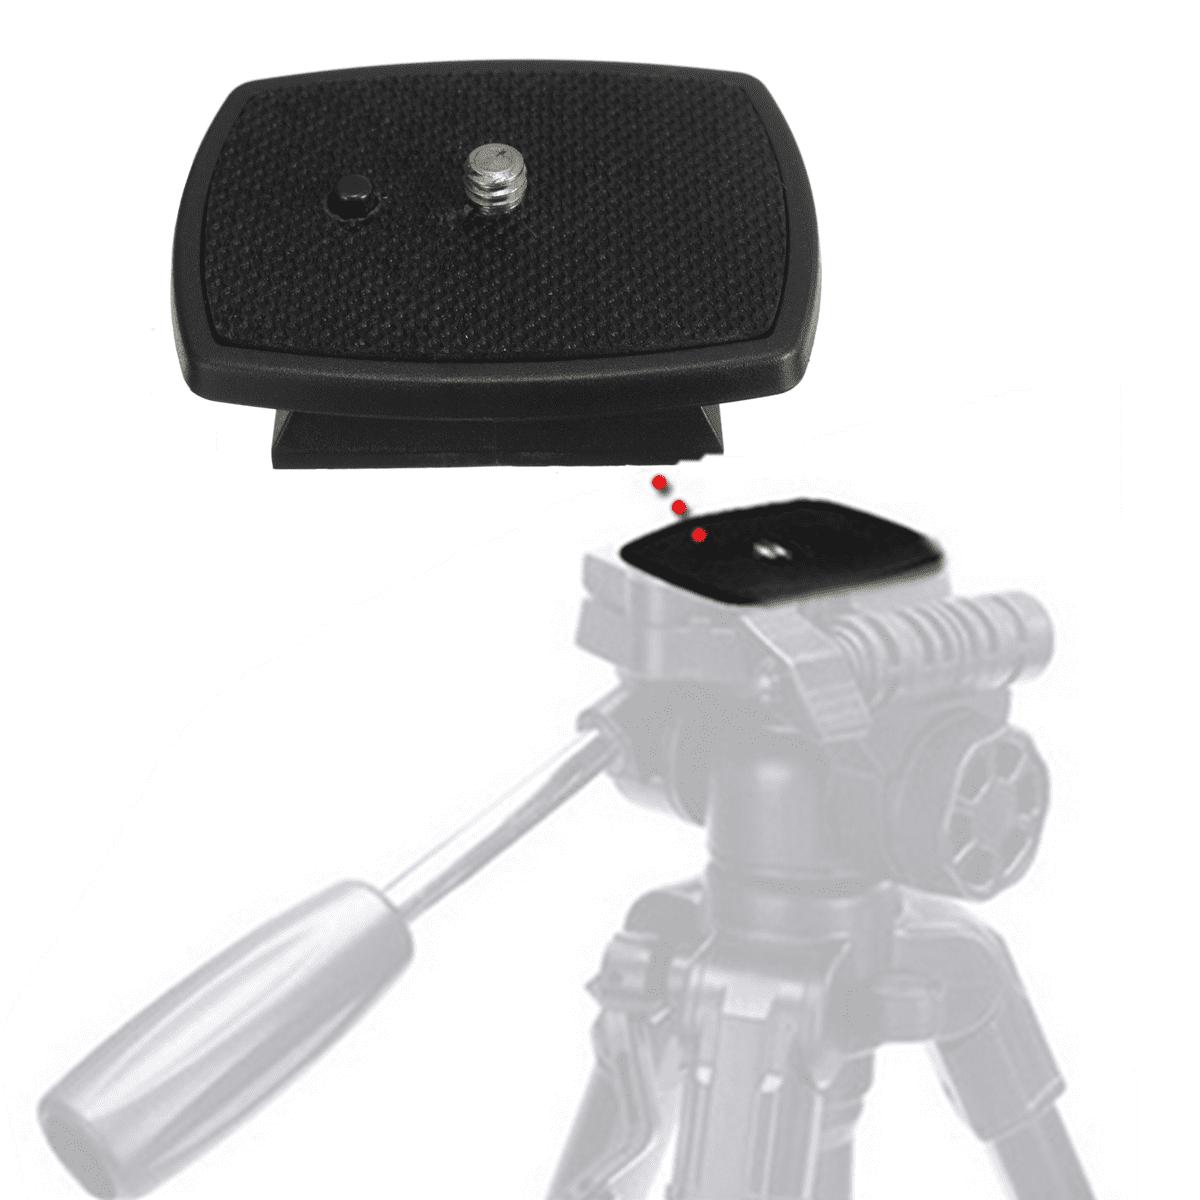 Quick Release Plate Adapter Tripod Mount Head For Canon DSLR SLR Camera - Walmart.com